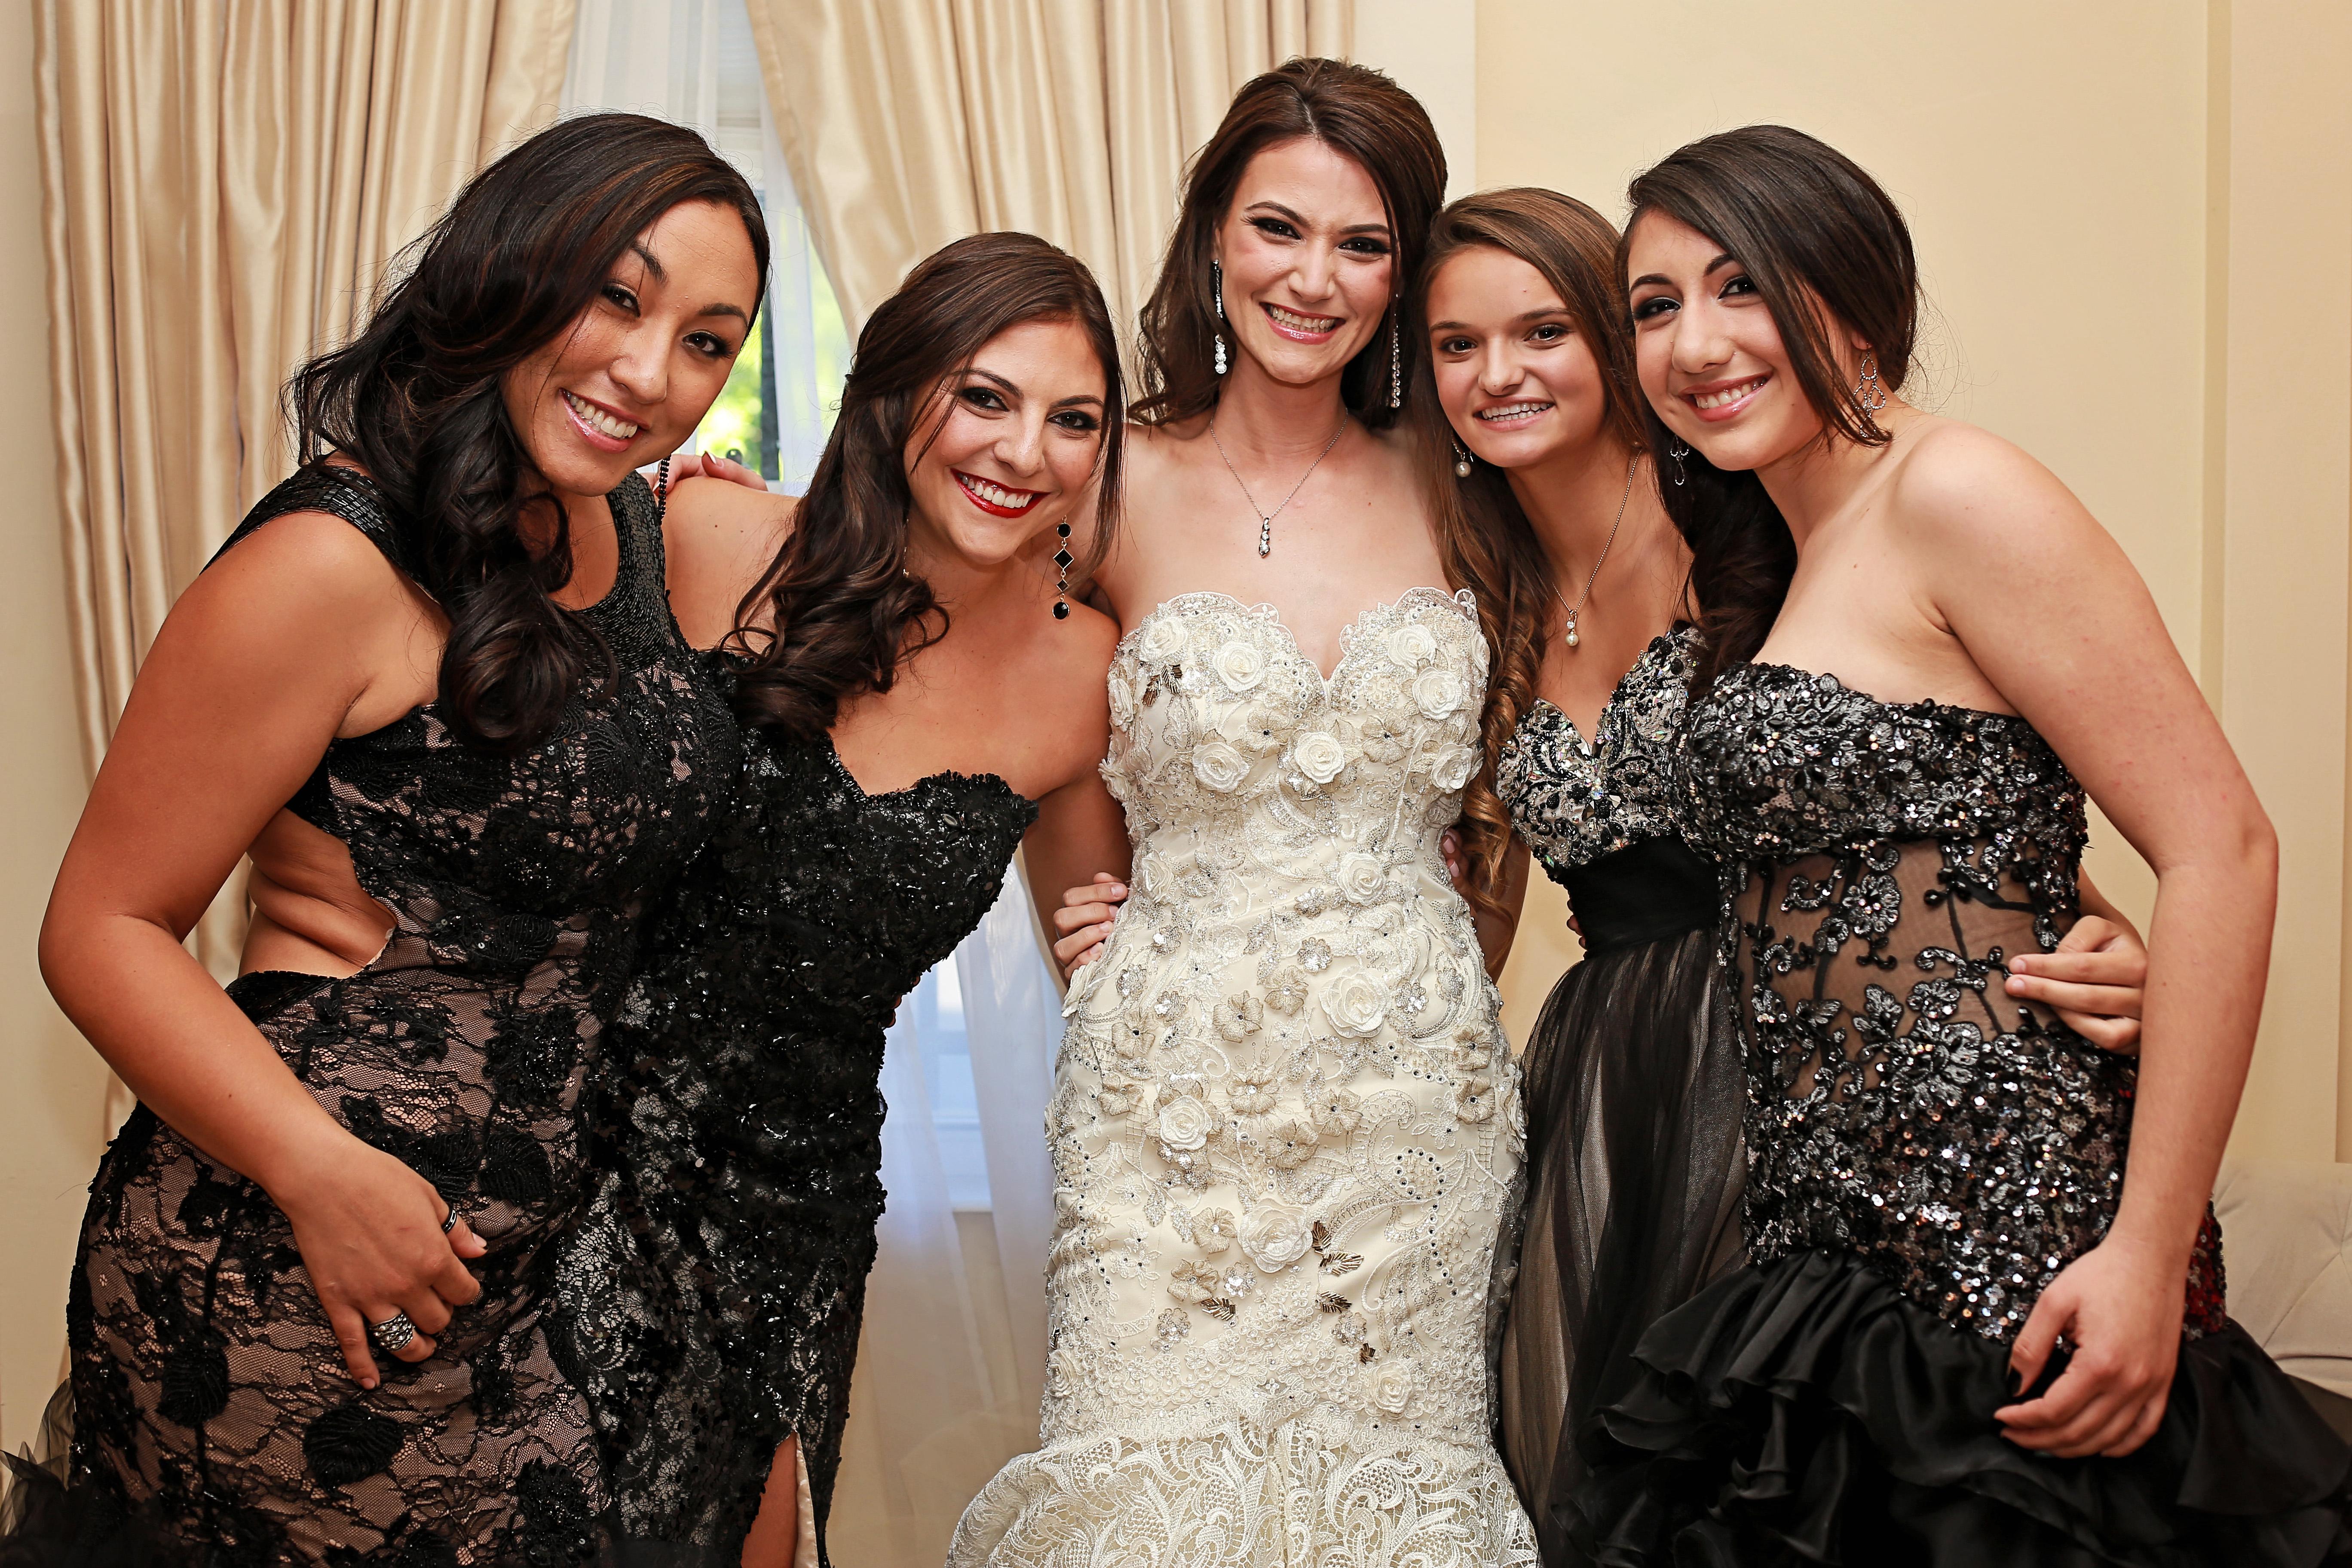 Miami FL Bride and Bridesmaids